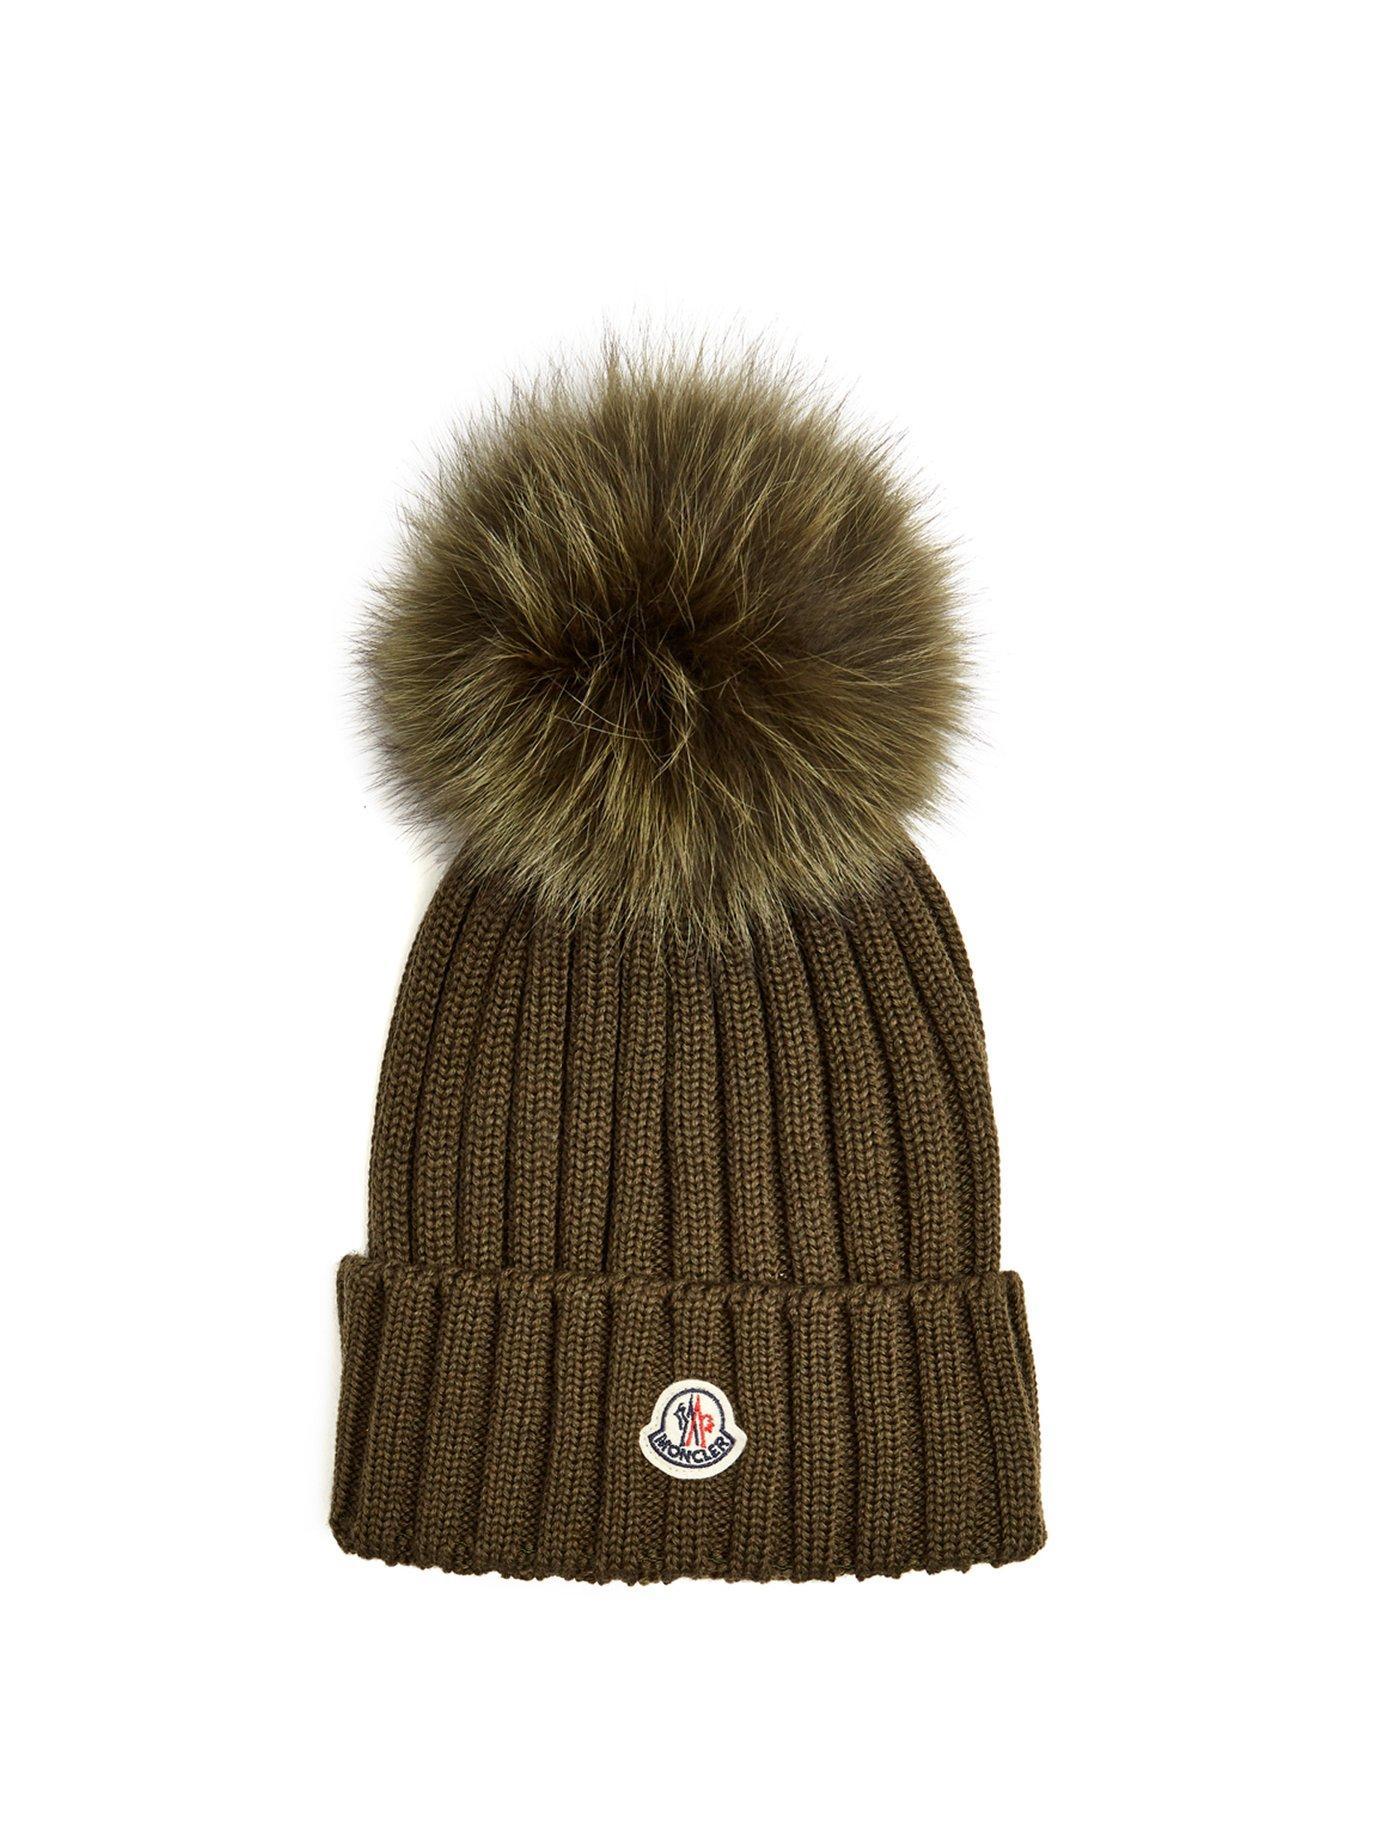 0ded552e095 Moncler Grey Wool Beanie Hat With Pom Pom